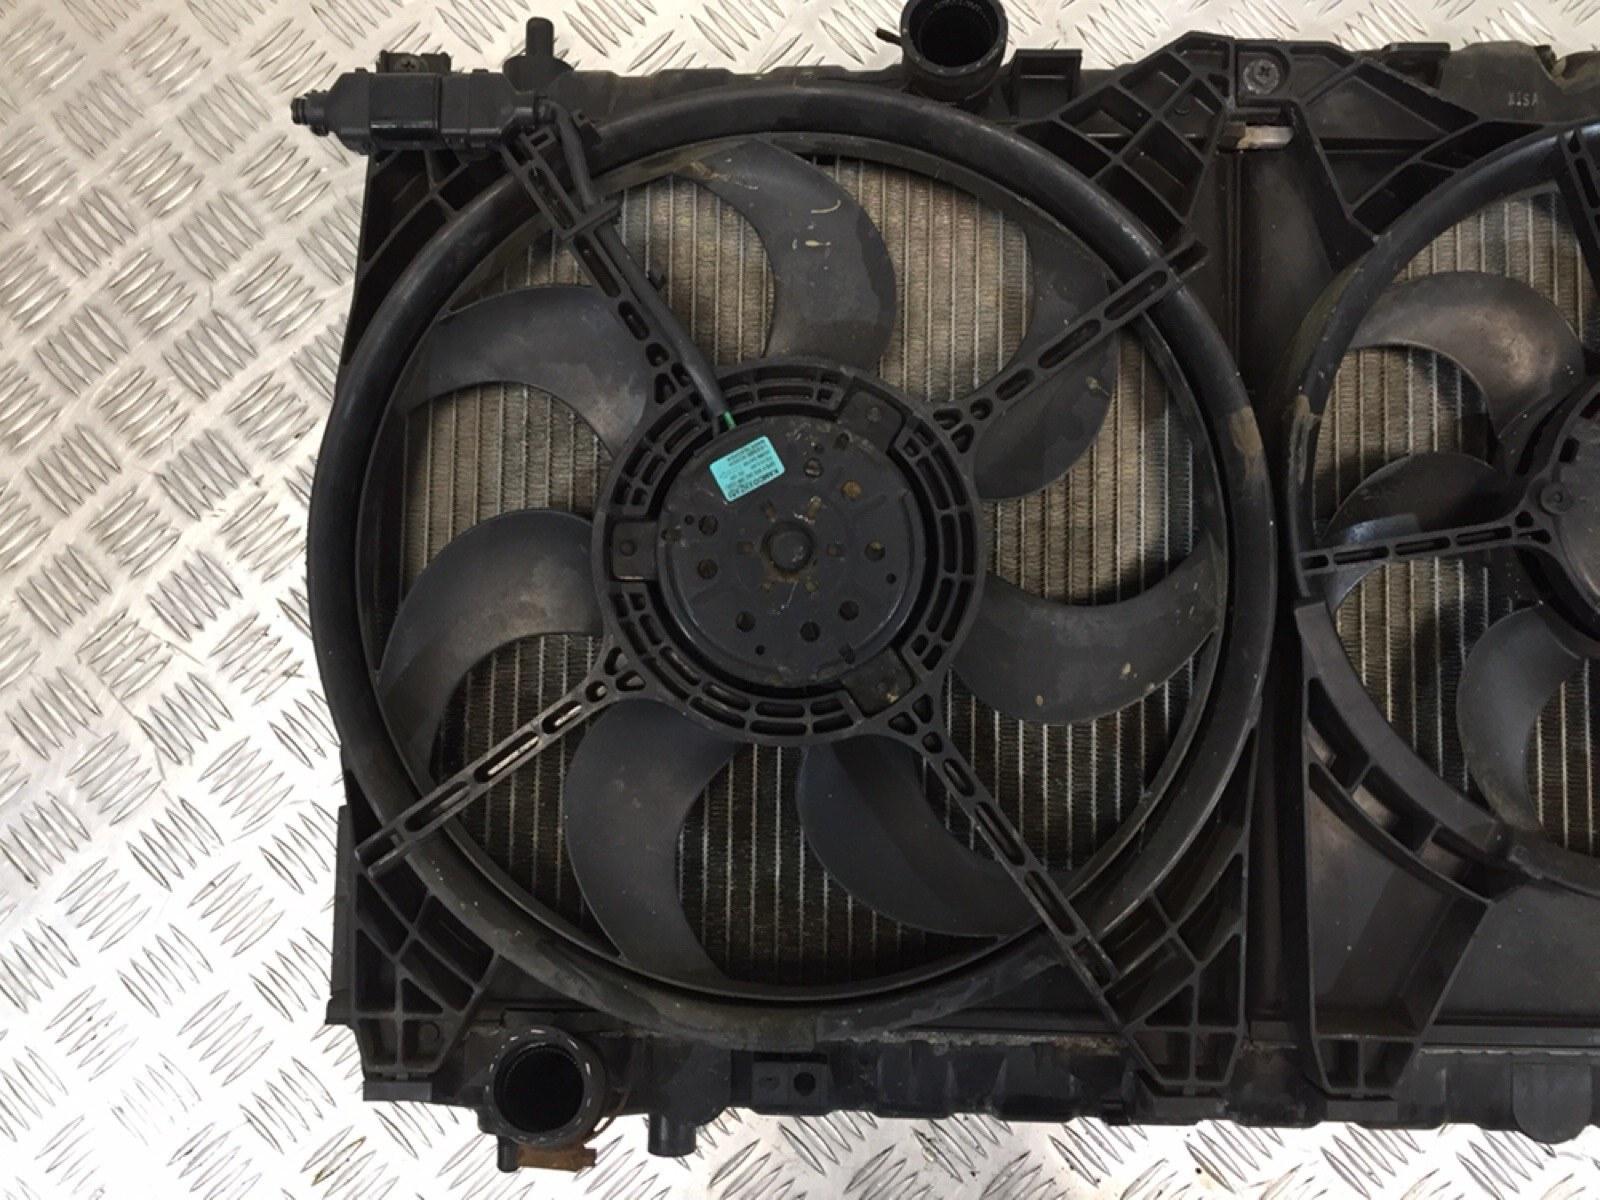 Вентилятор радиатора Hyundai Trajet 2.0 I 2004 (б/у)